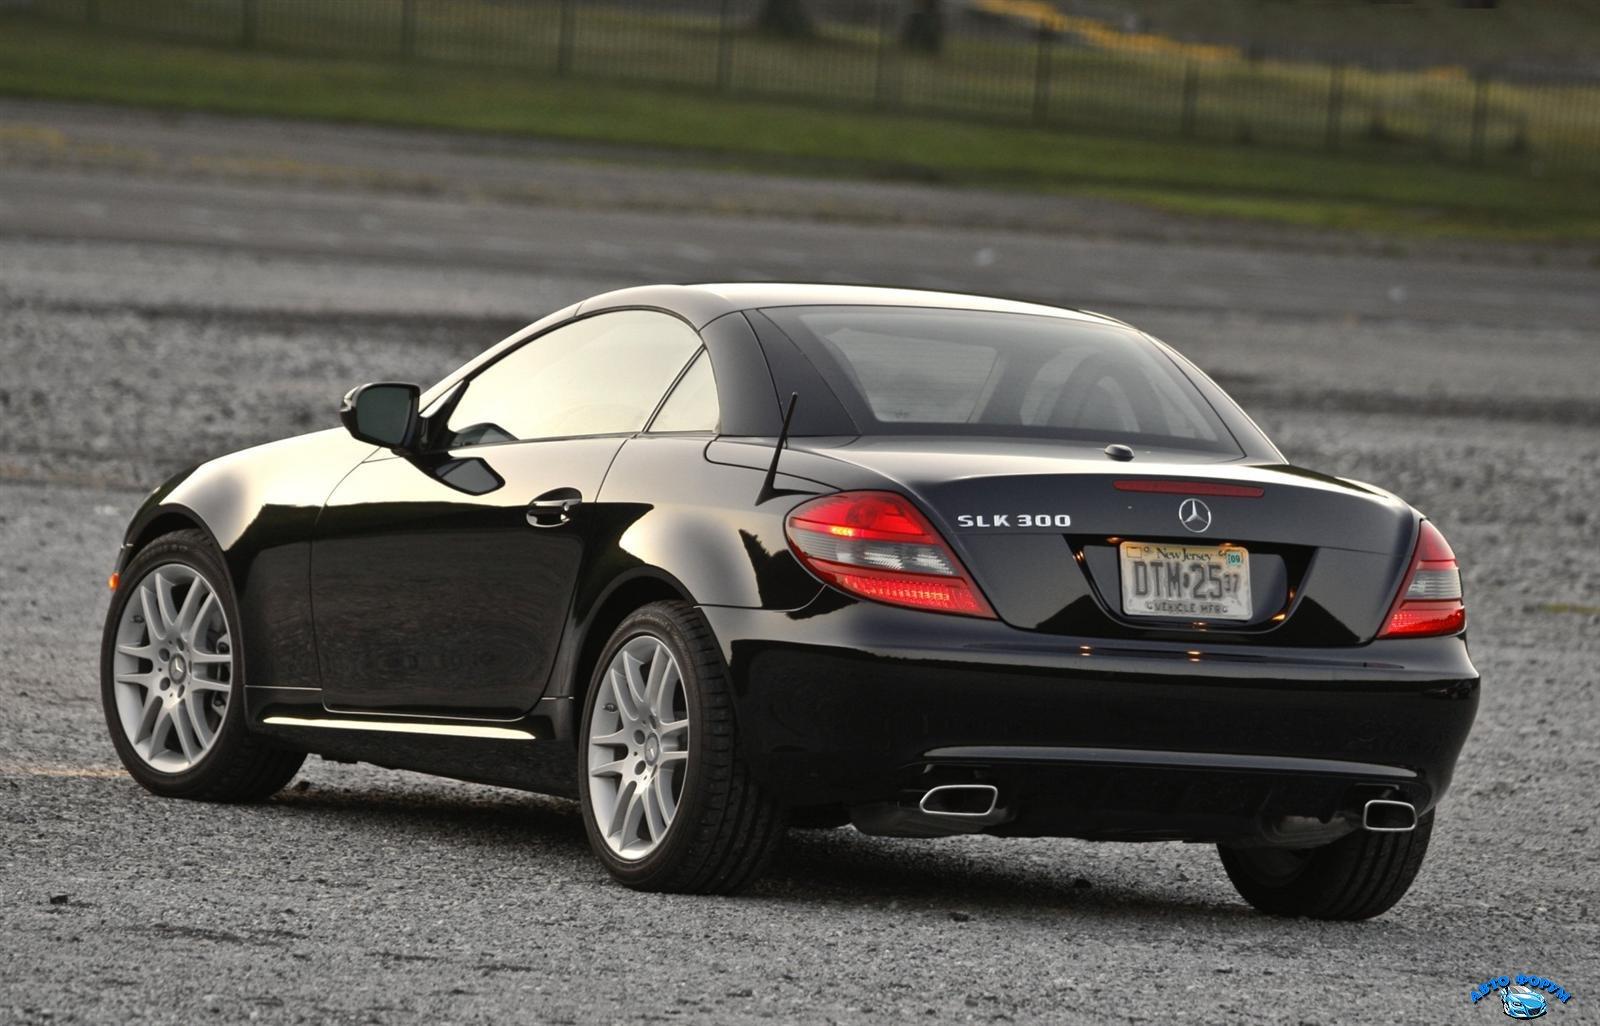 2010-Mercedes-Benz-SLK-Class-Image-052-1600.jpg